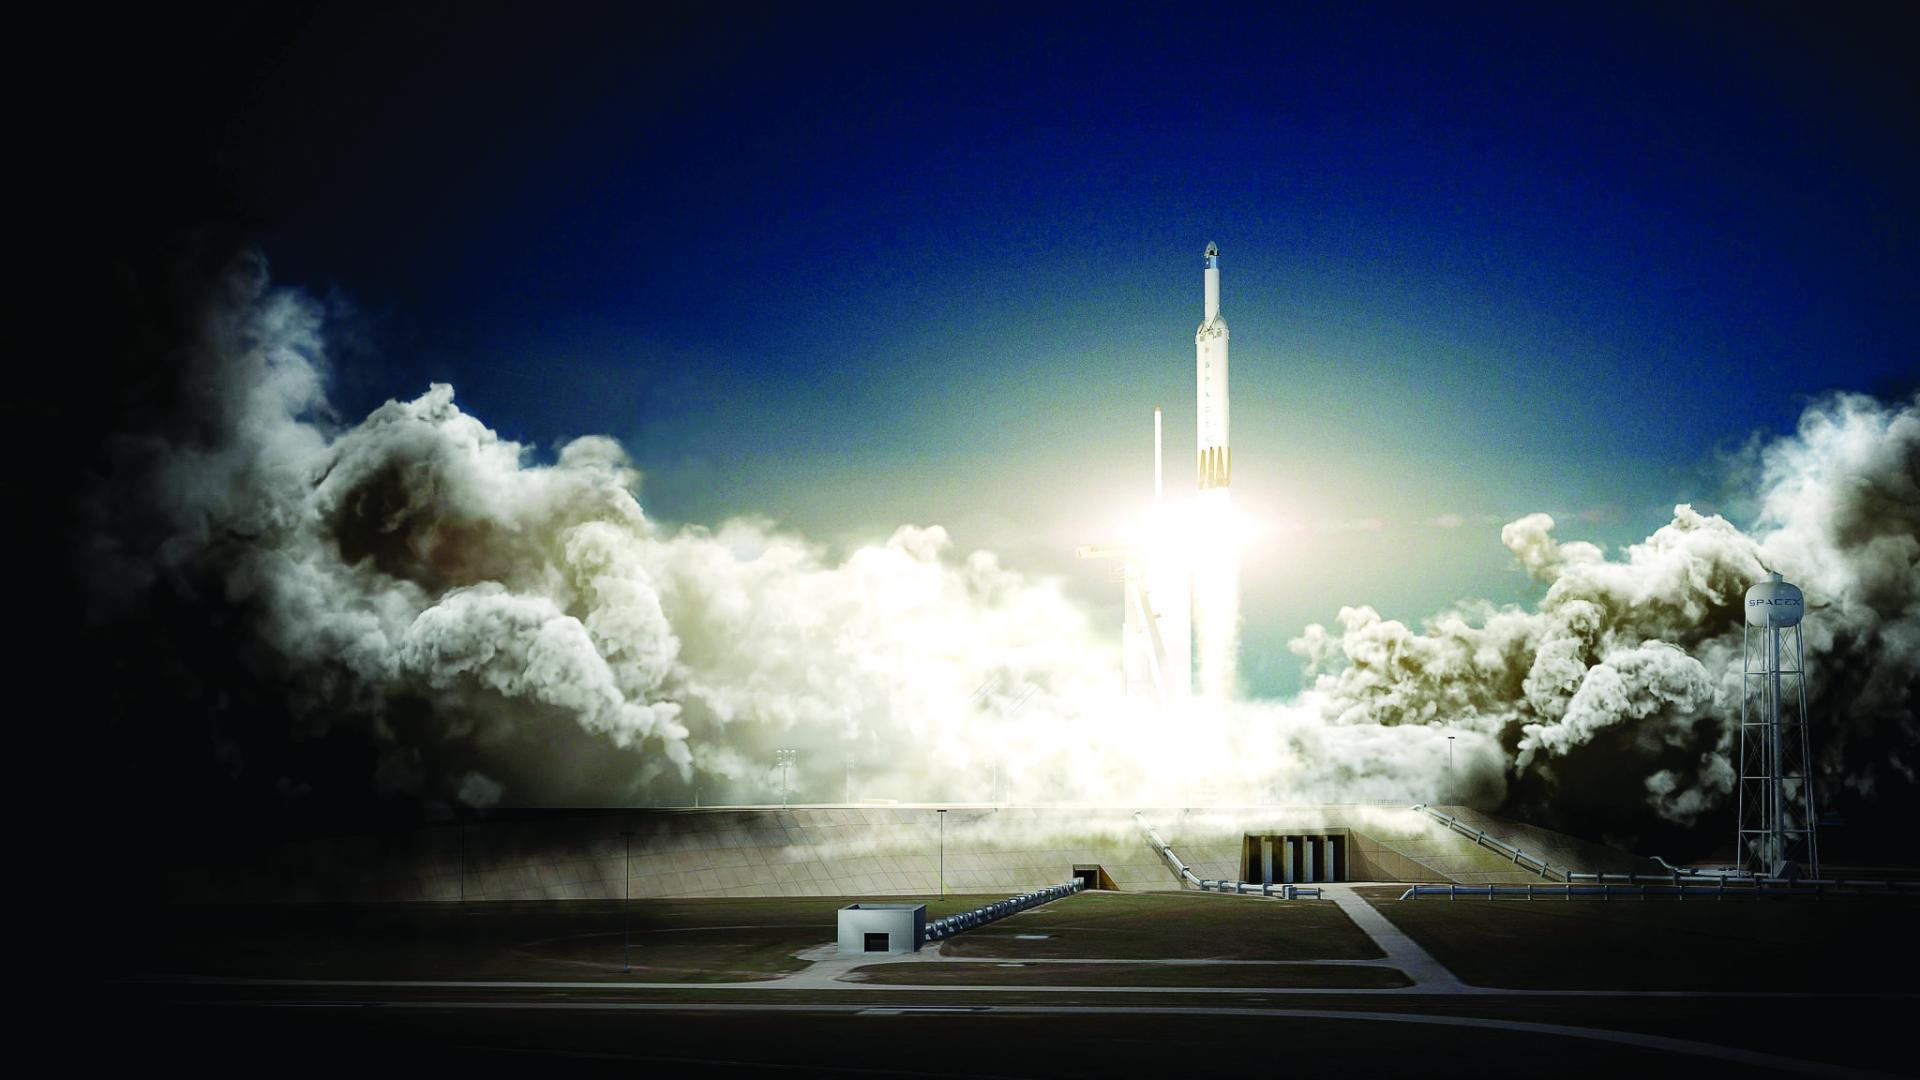 Elon Musk – Ο άνθρωπος που άλλαξε τον κόσμο